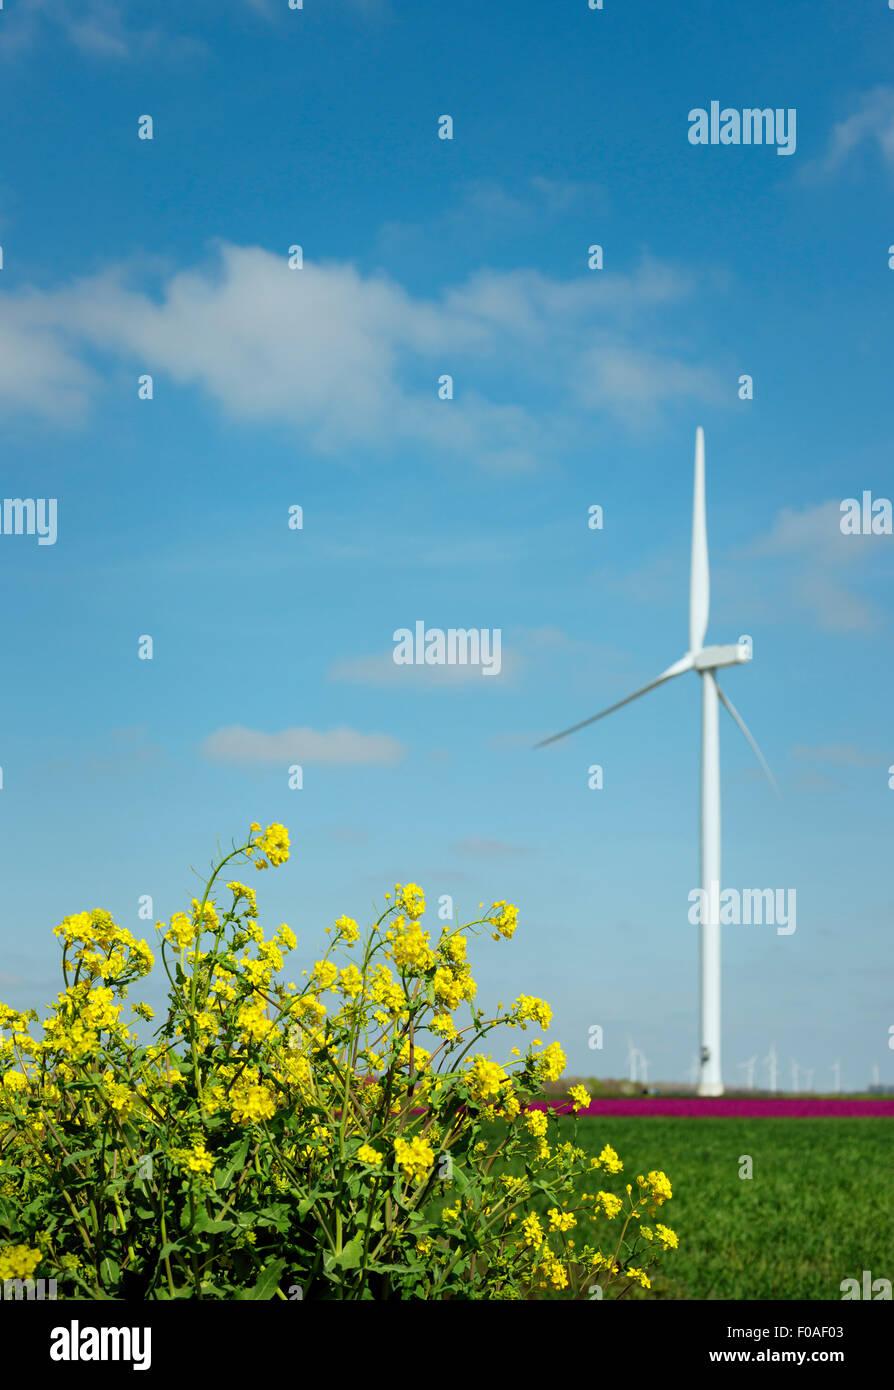 Yellow weed in front of magenta flower blooms and wind turbine, Zeewolde, Flevoland, Netherlands - Stock Image